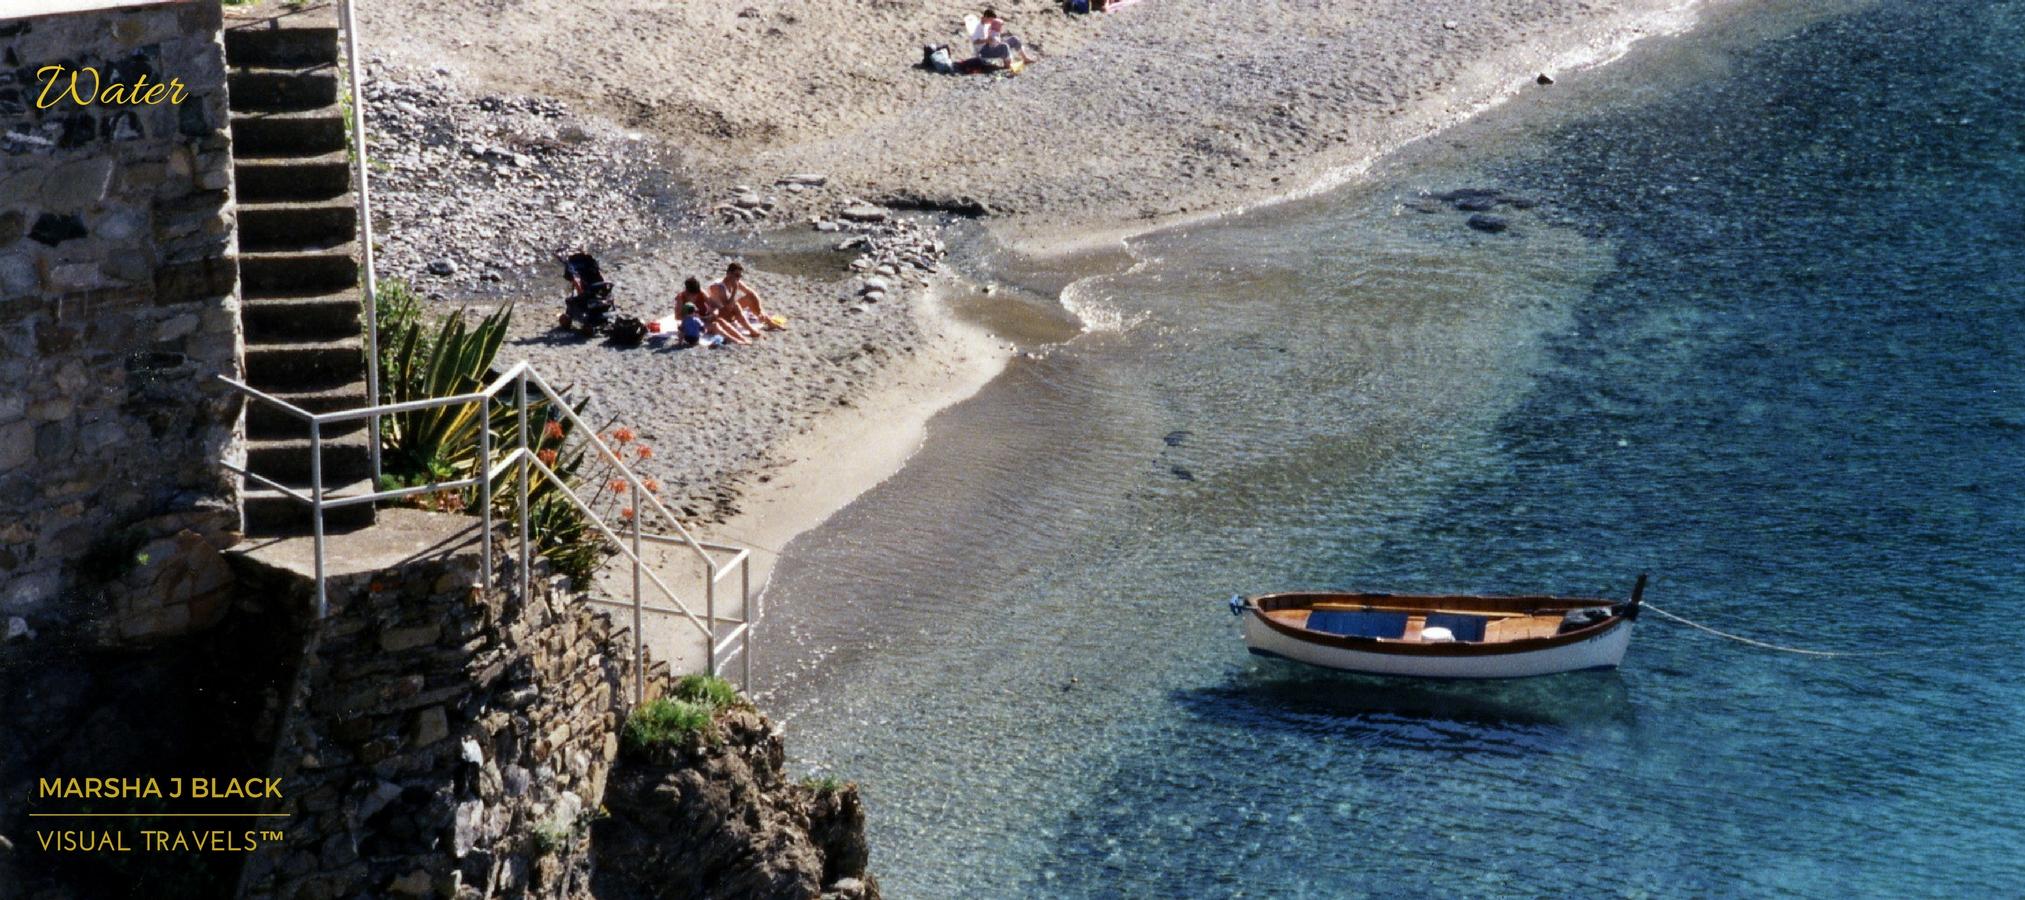 Monterosso-Italy-Marsha-Black-2025-900-Marsha-J-Black